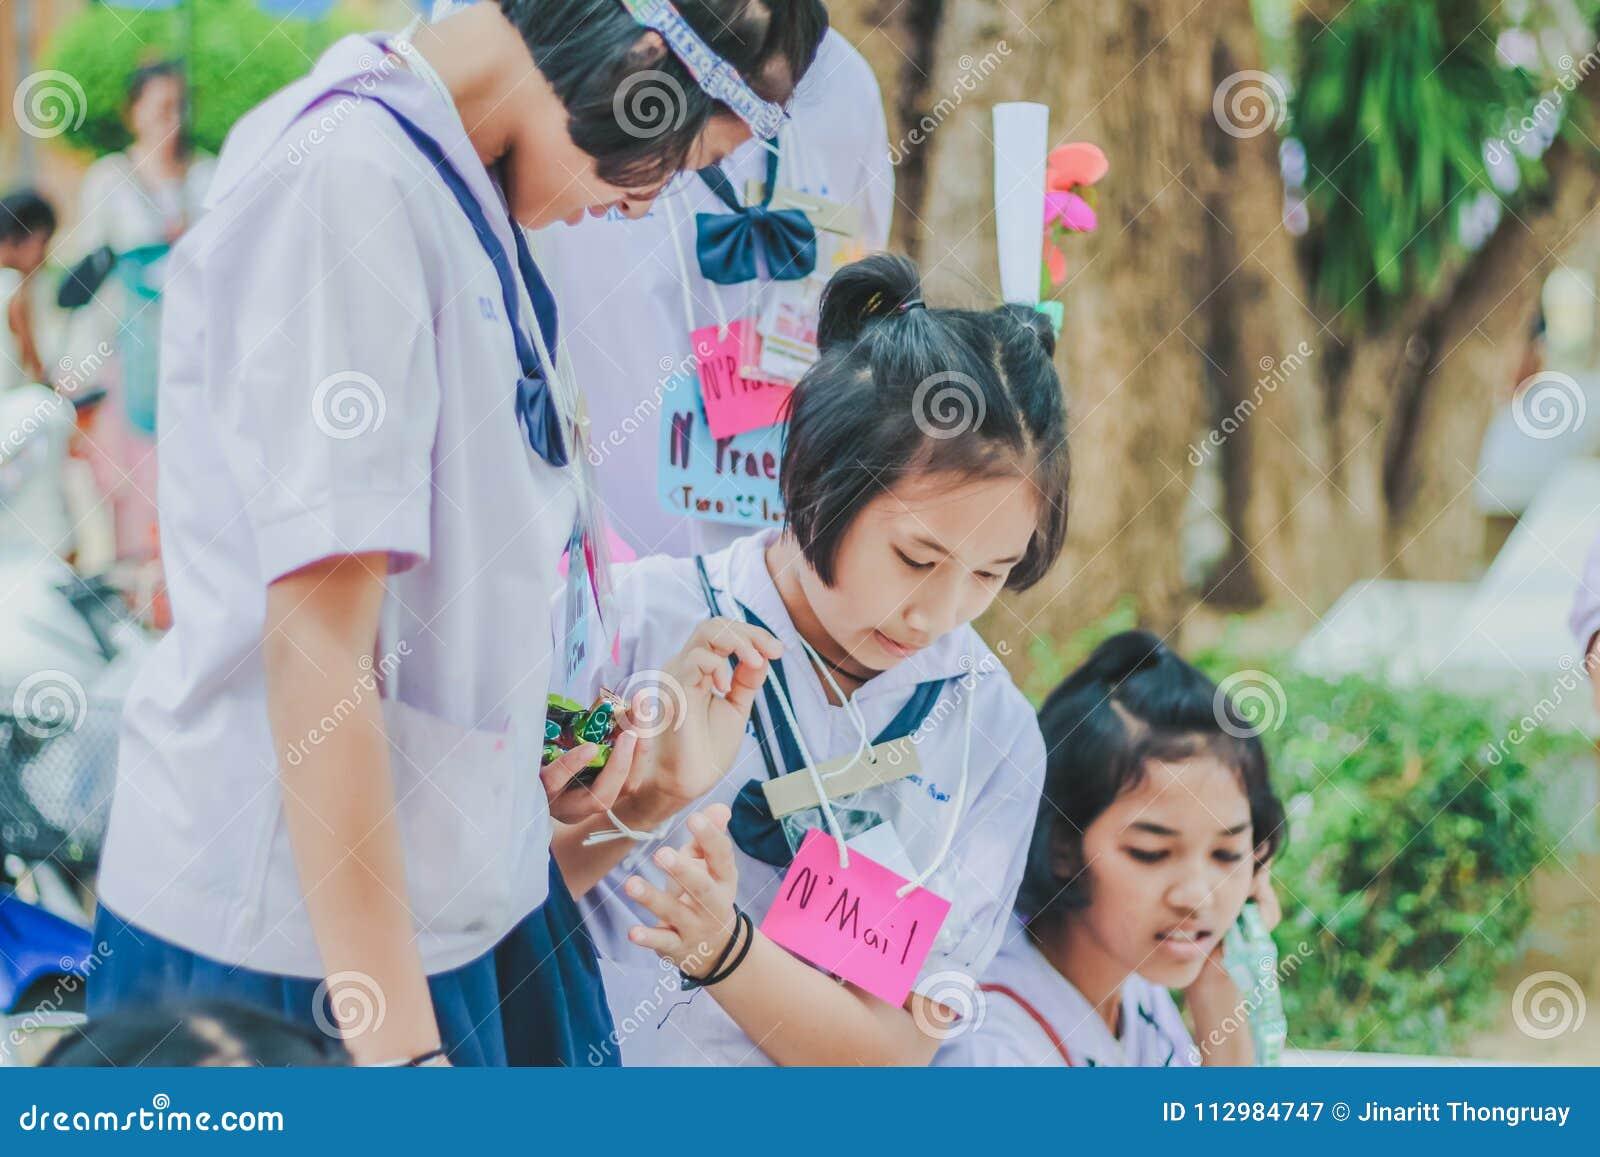 KANCHANABURI THAILAND - MARCH 23 : Wat Krangthong school provid